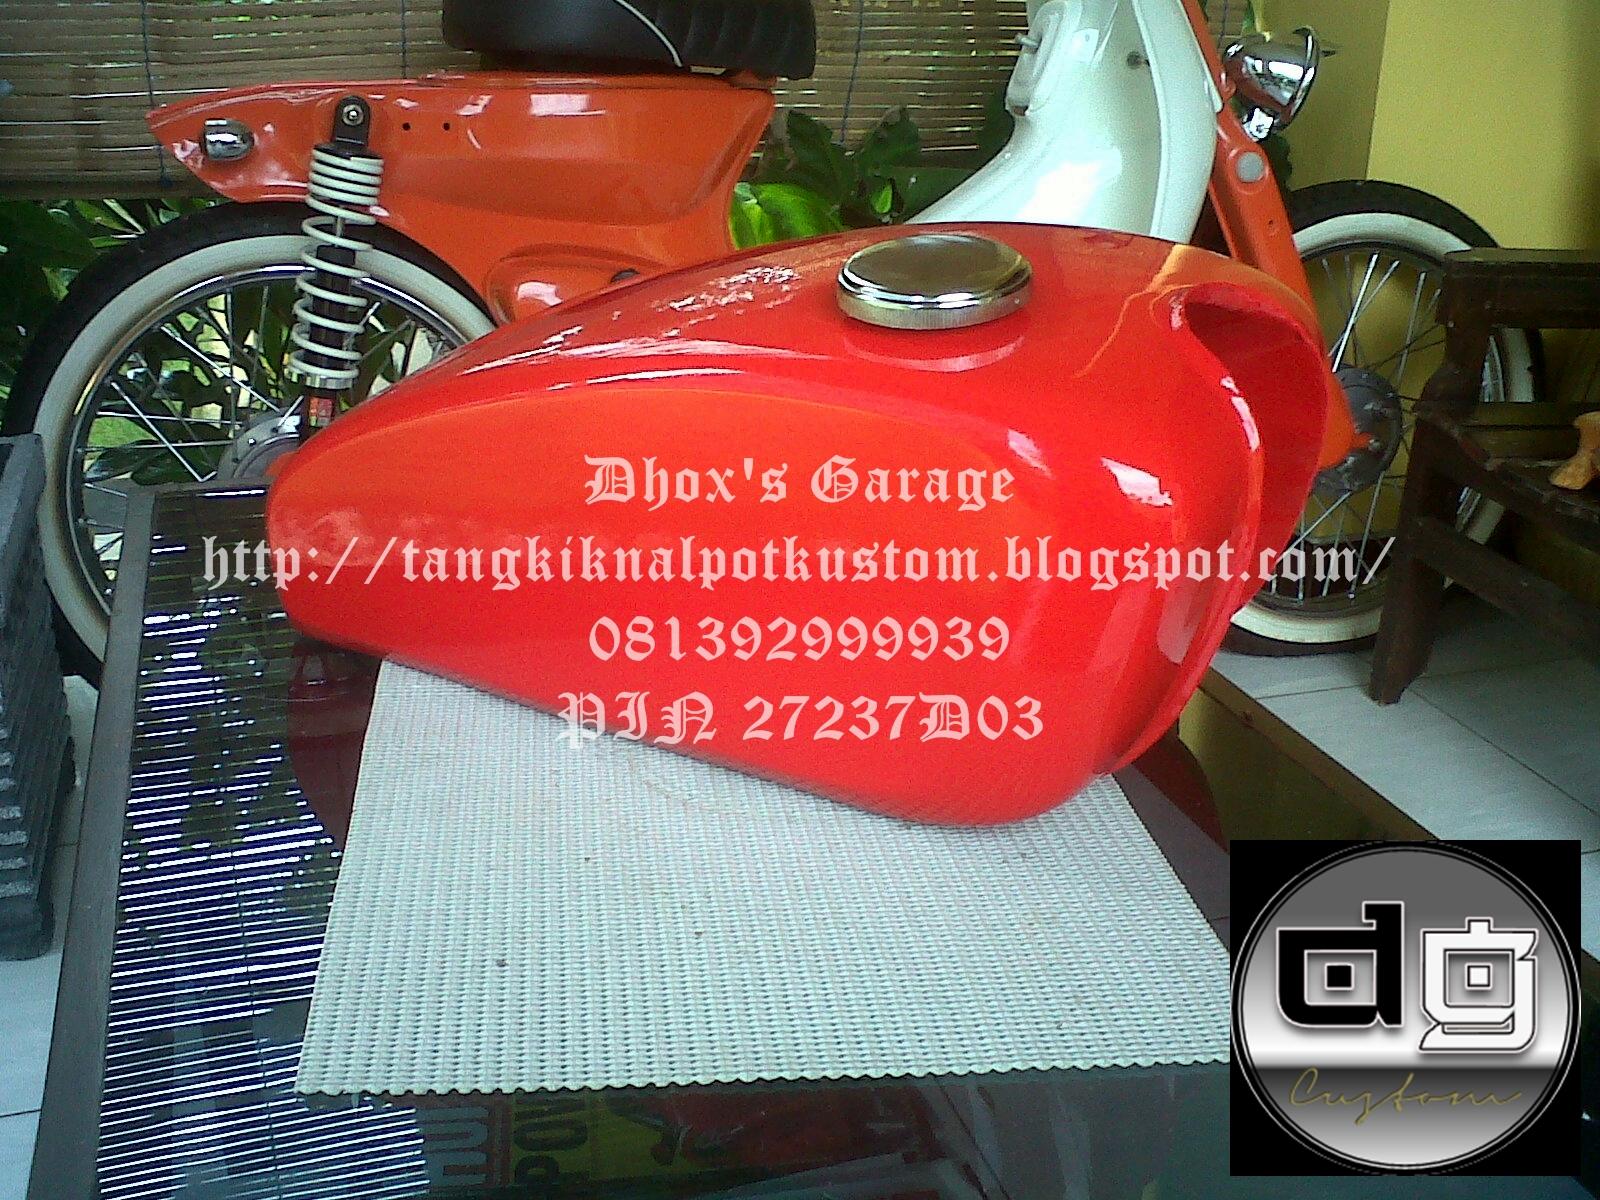 Tangki Kustom Japstyle Bratstyle Model Easy Rider 2 title=